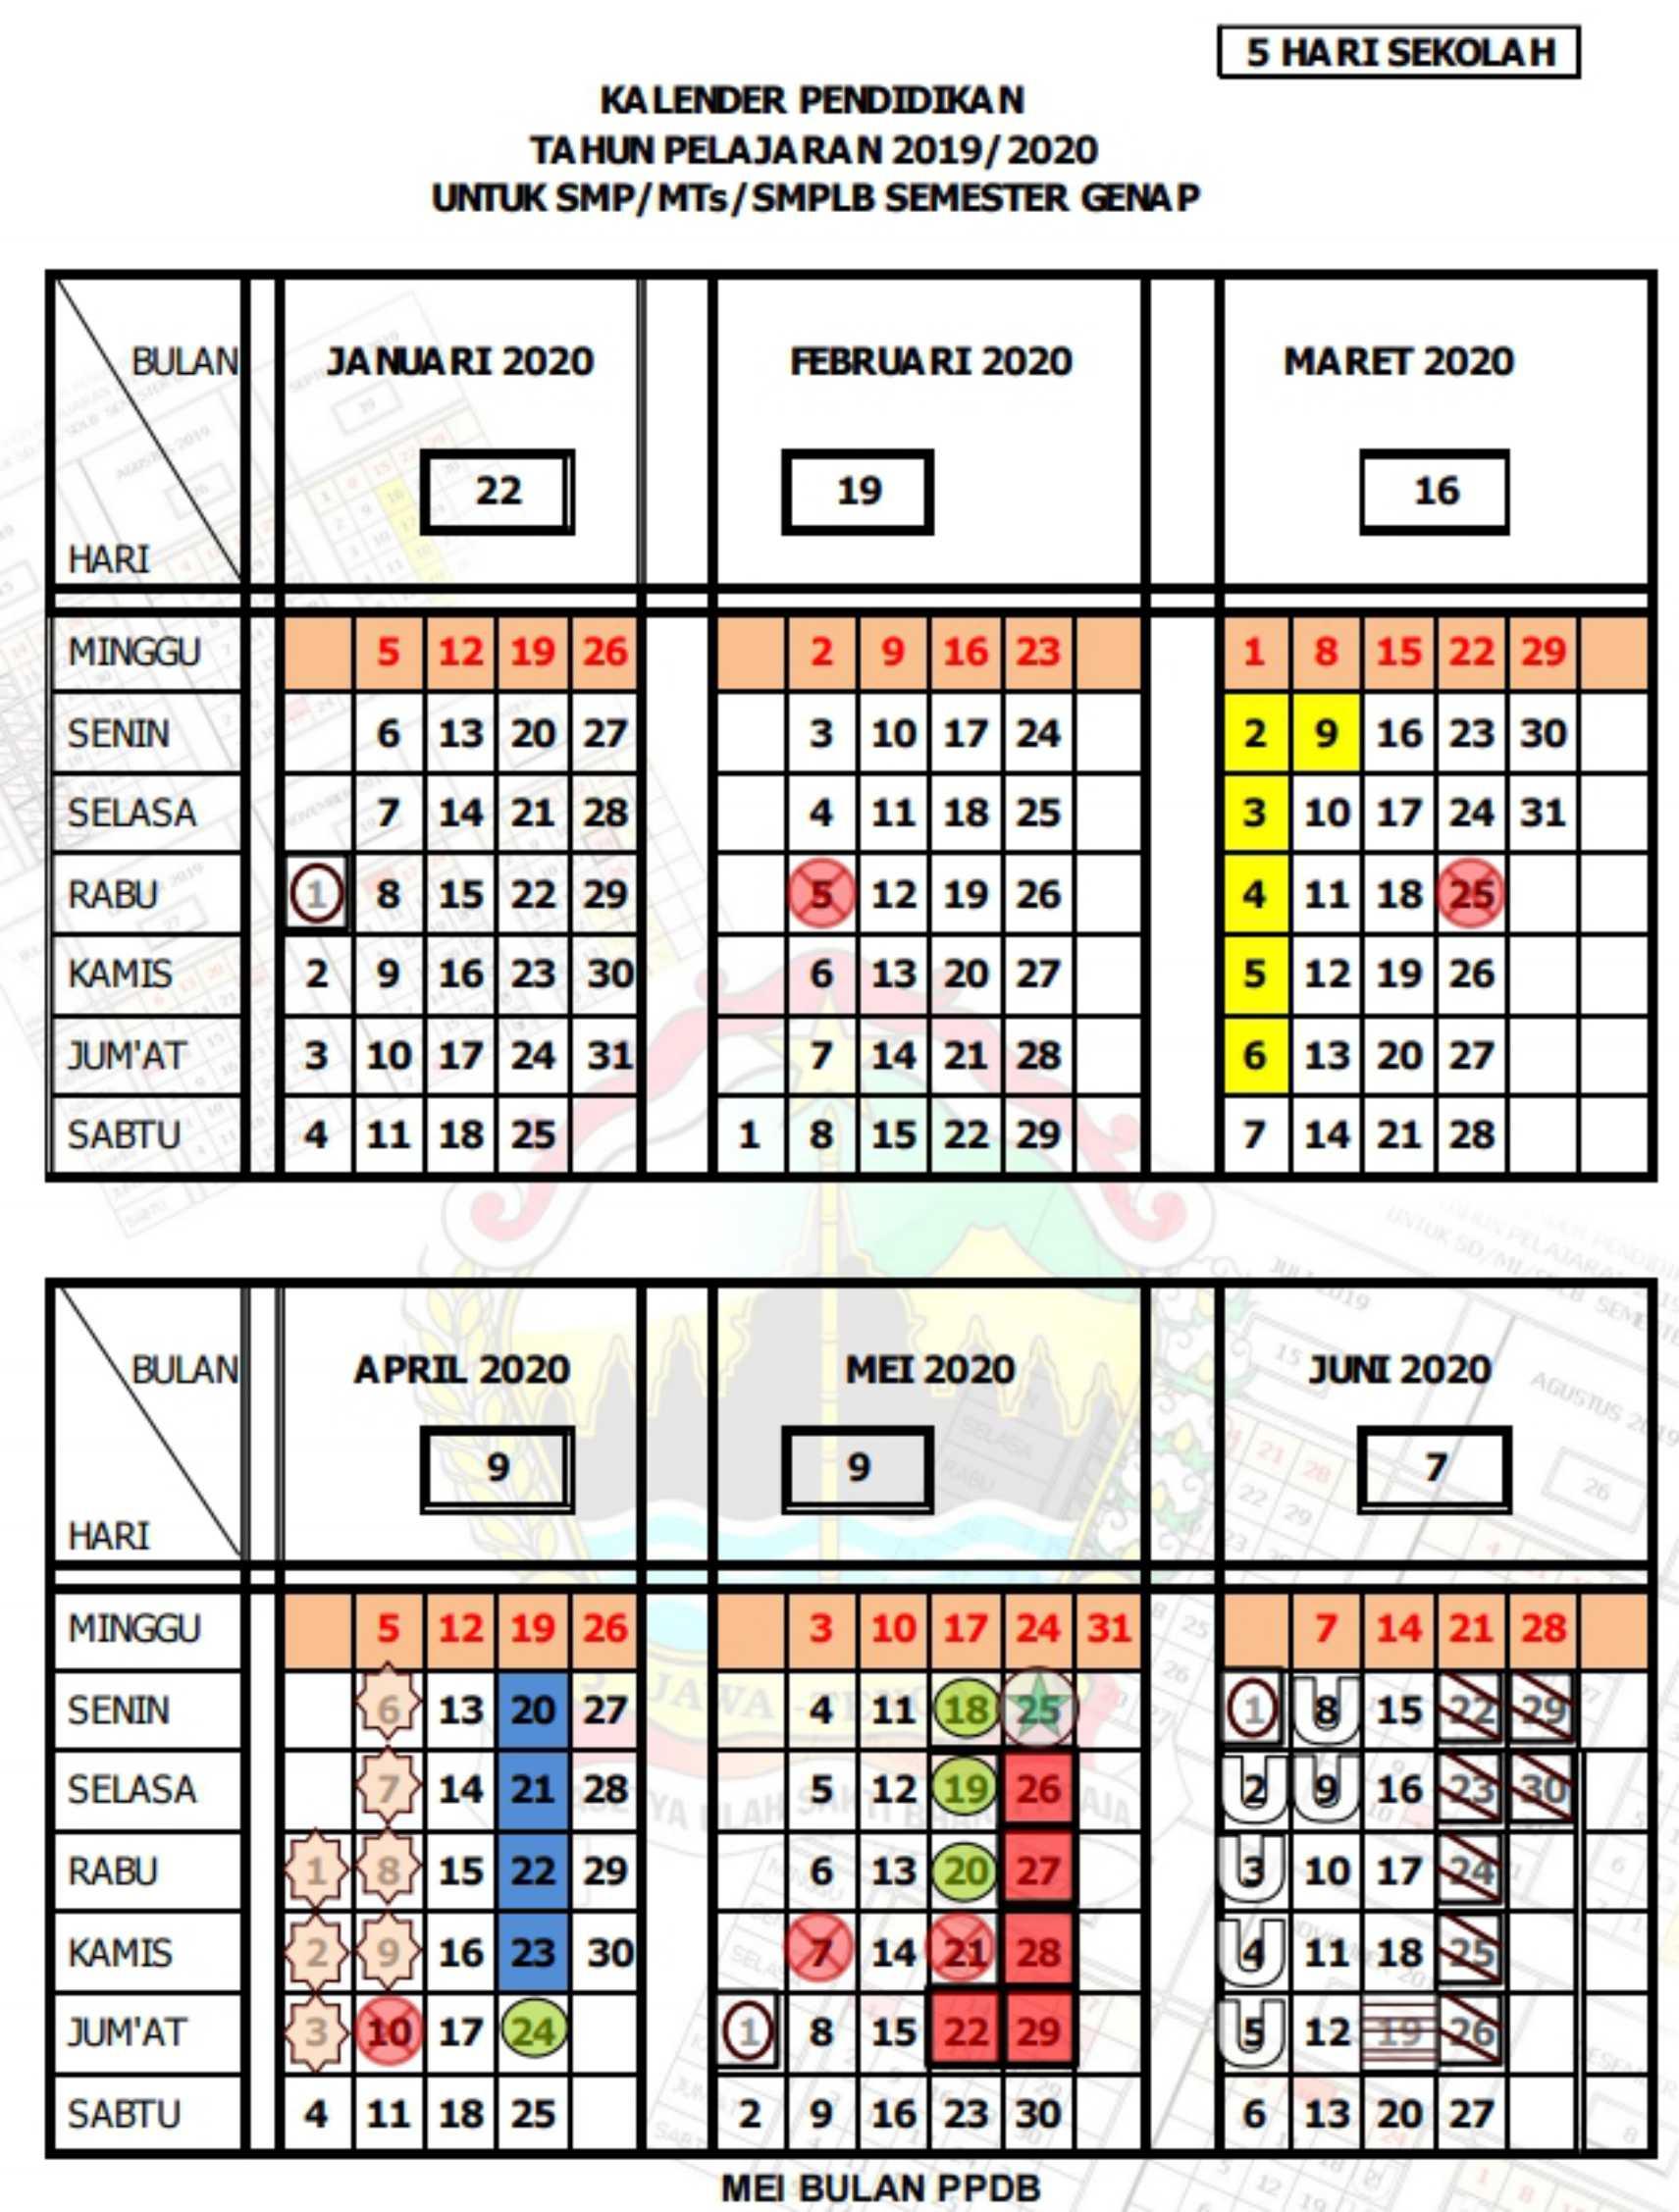 kalender pendidikan tahun pelajaran 2019 - 2020 semester genap (5 hari sekolah) SMP SMPLB MTs provinsi jawa tengah